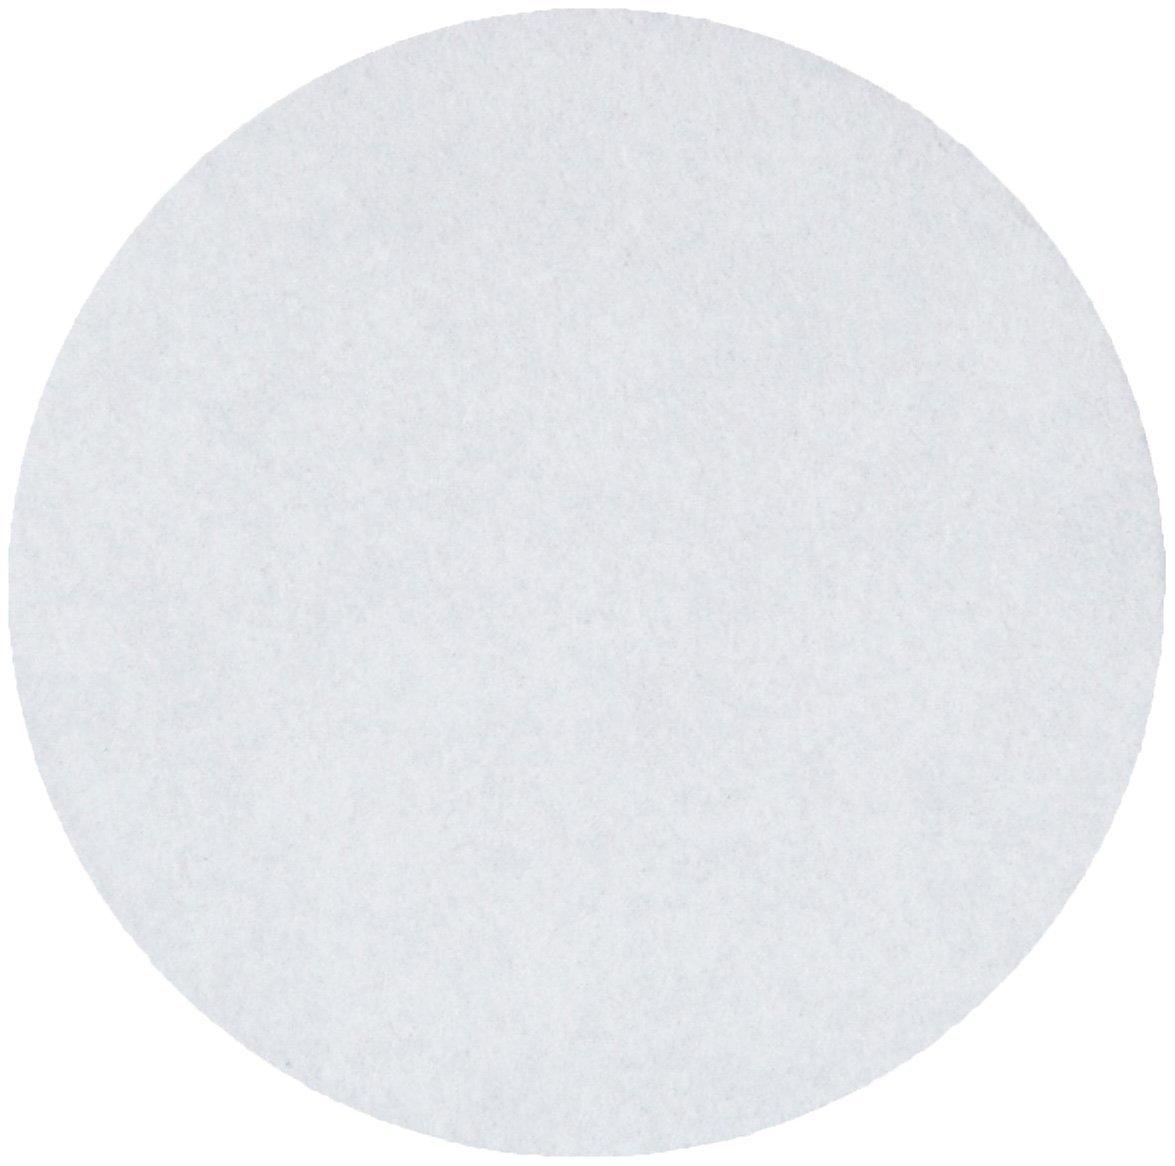 Grade 589//2 Pack of 100 4-12 Micron WHA-10300110 Whatman 10300110 Ashless Quantitative Filter Paper 110mm Diameter